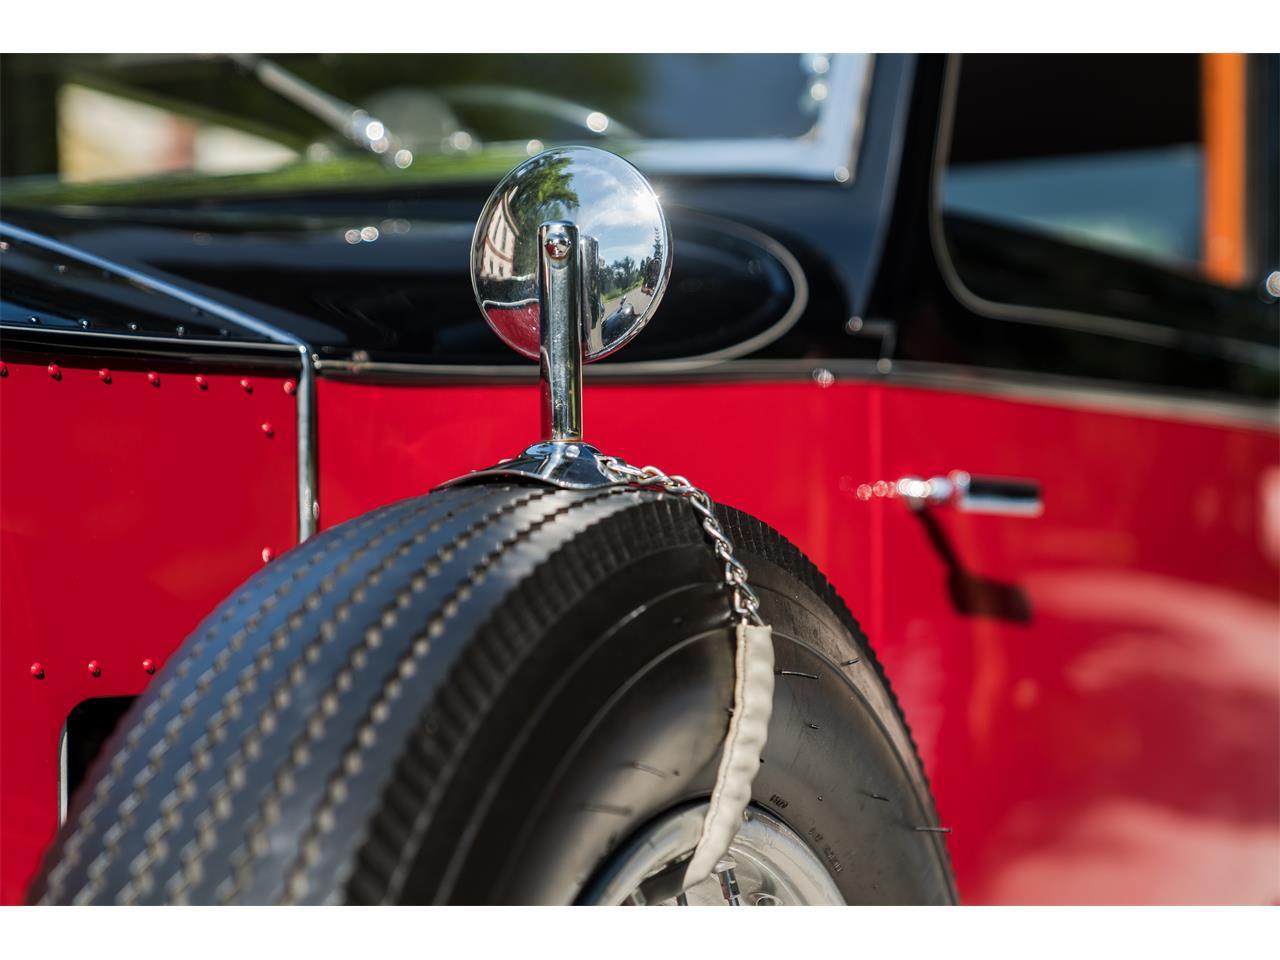 1931 Rolls-Royce Phantom II (CC-1415611) for sale in Philadelphia, Pennsylvania